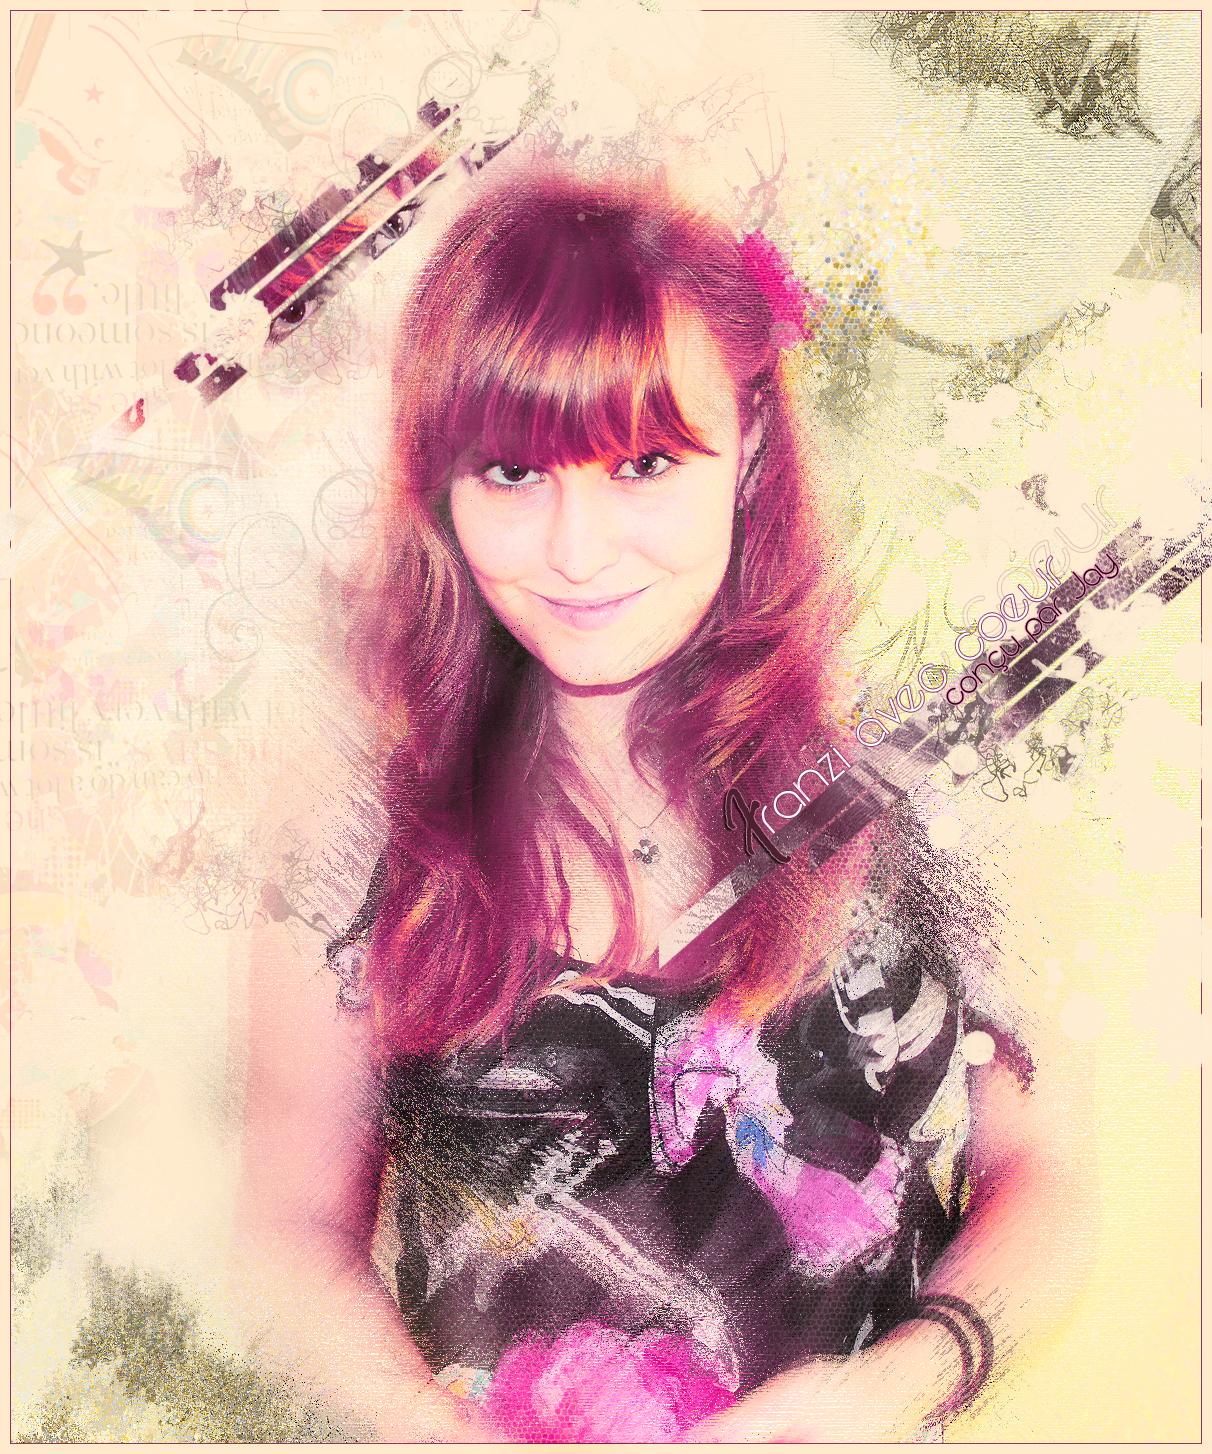 glamsplat_girl_by_jay_jay88-d3aijym.jpg